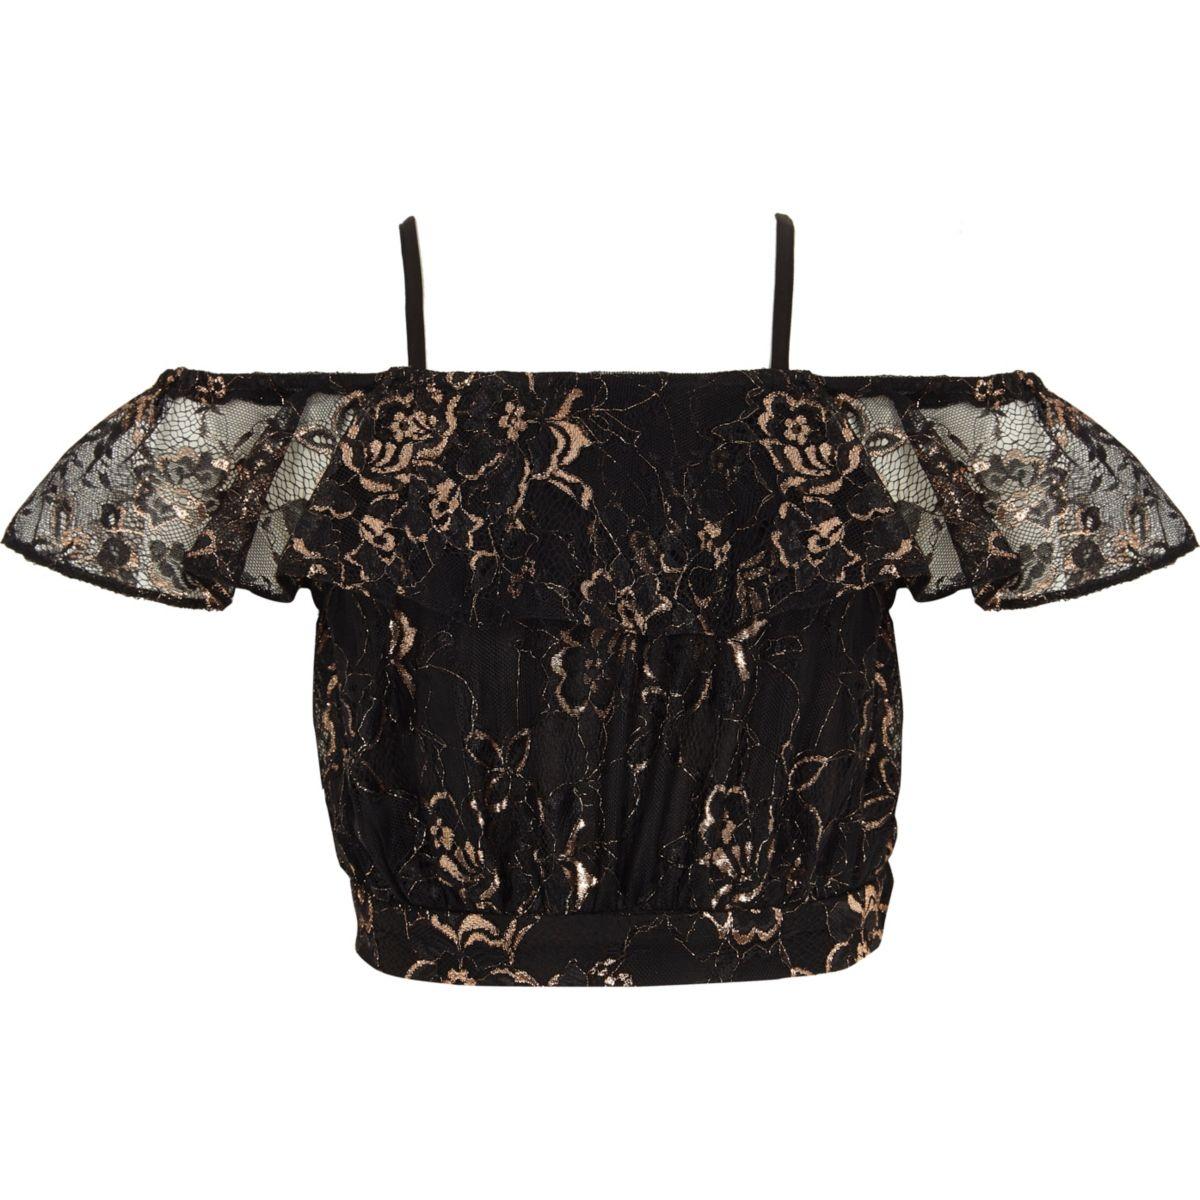 Girls black lace bardot cami crop top